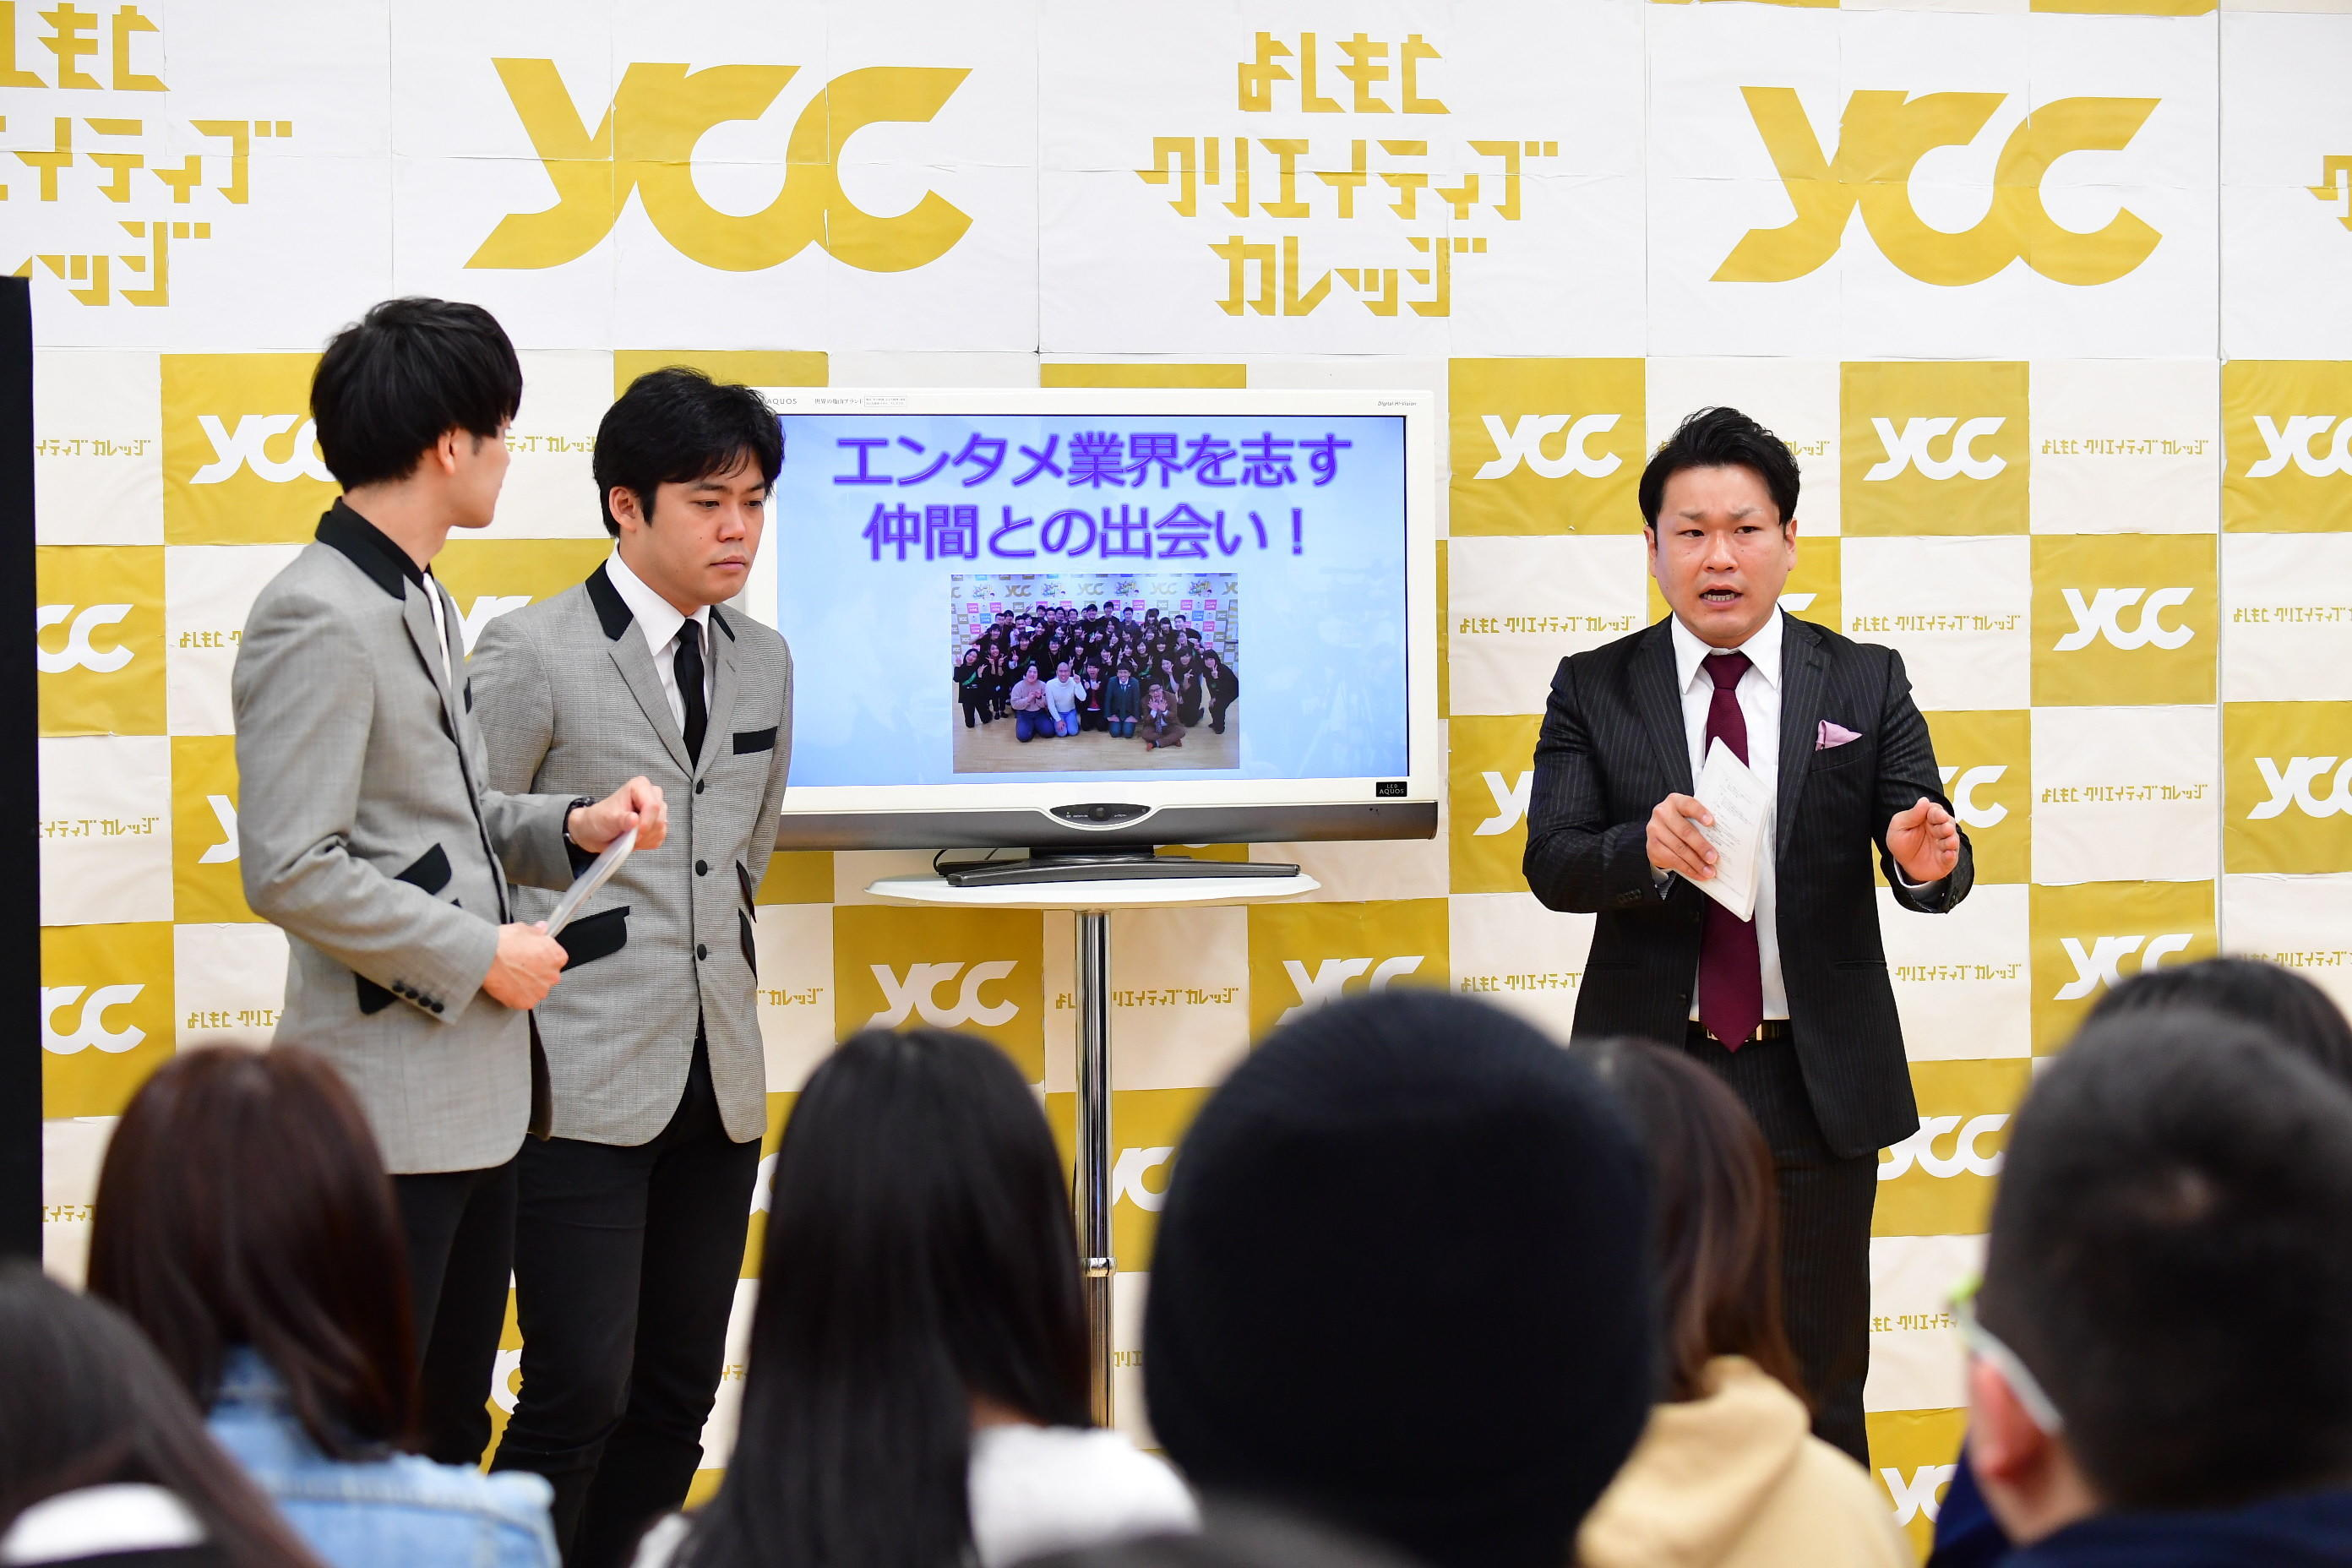 http://news.yoshimoto.co.jp/20180415153554-a9599ee85627551e40205b5cbd5bd4d81cbe4cc2.jpg